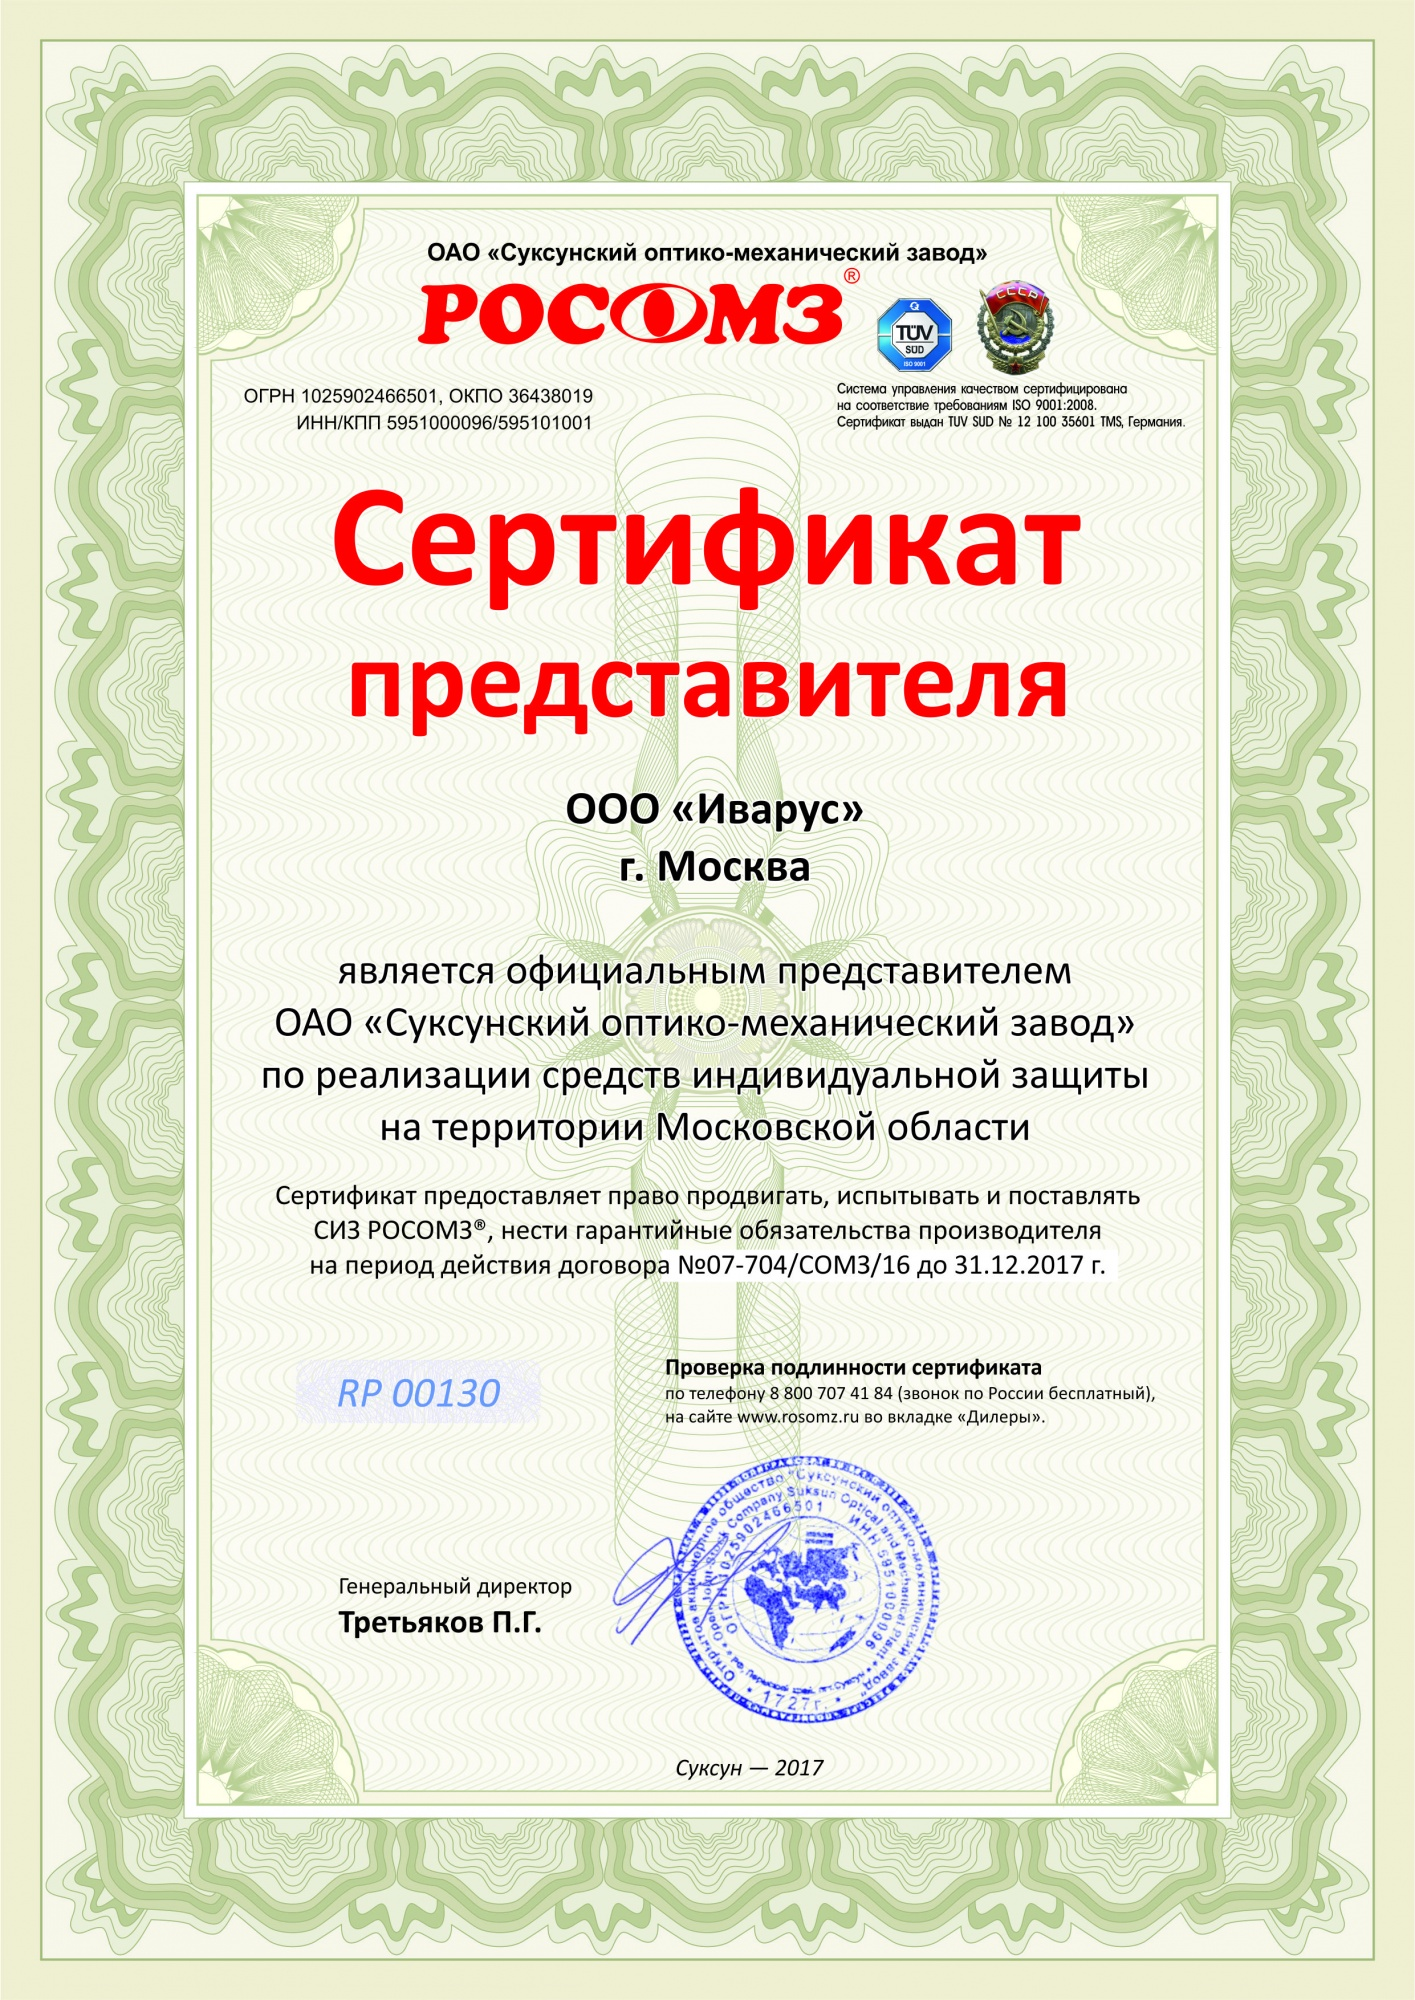 http://s5.uploads.ru/Qmdqa.jpg